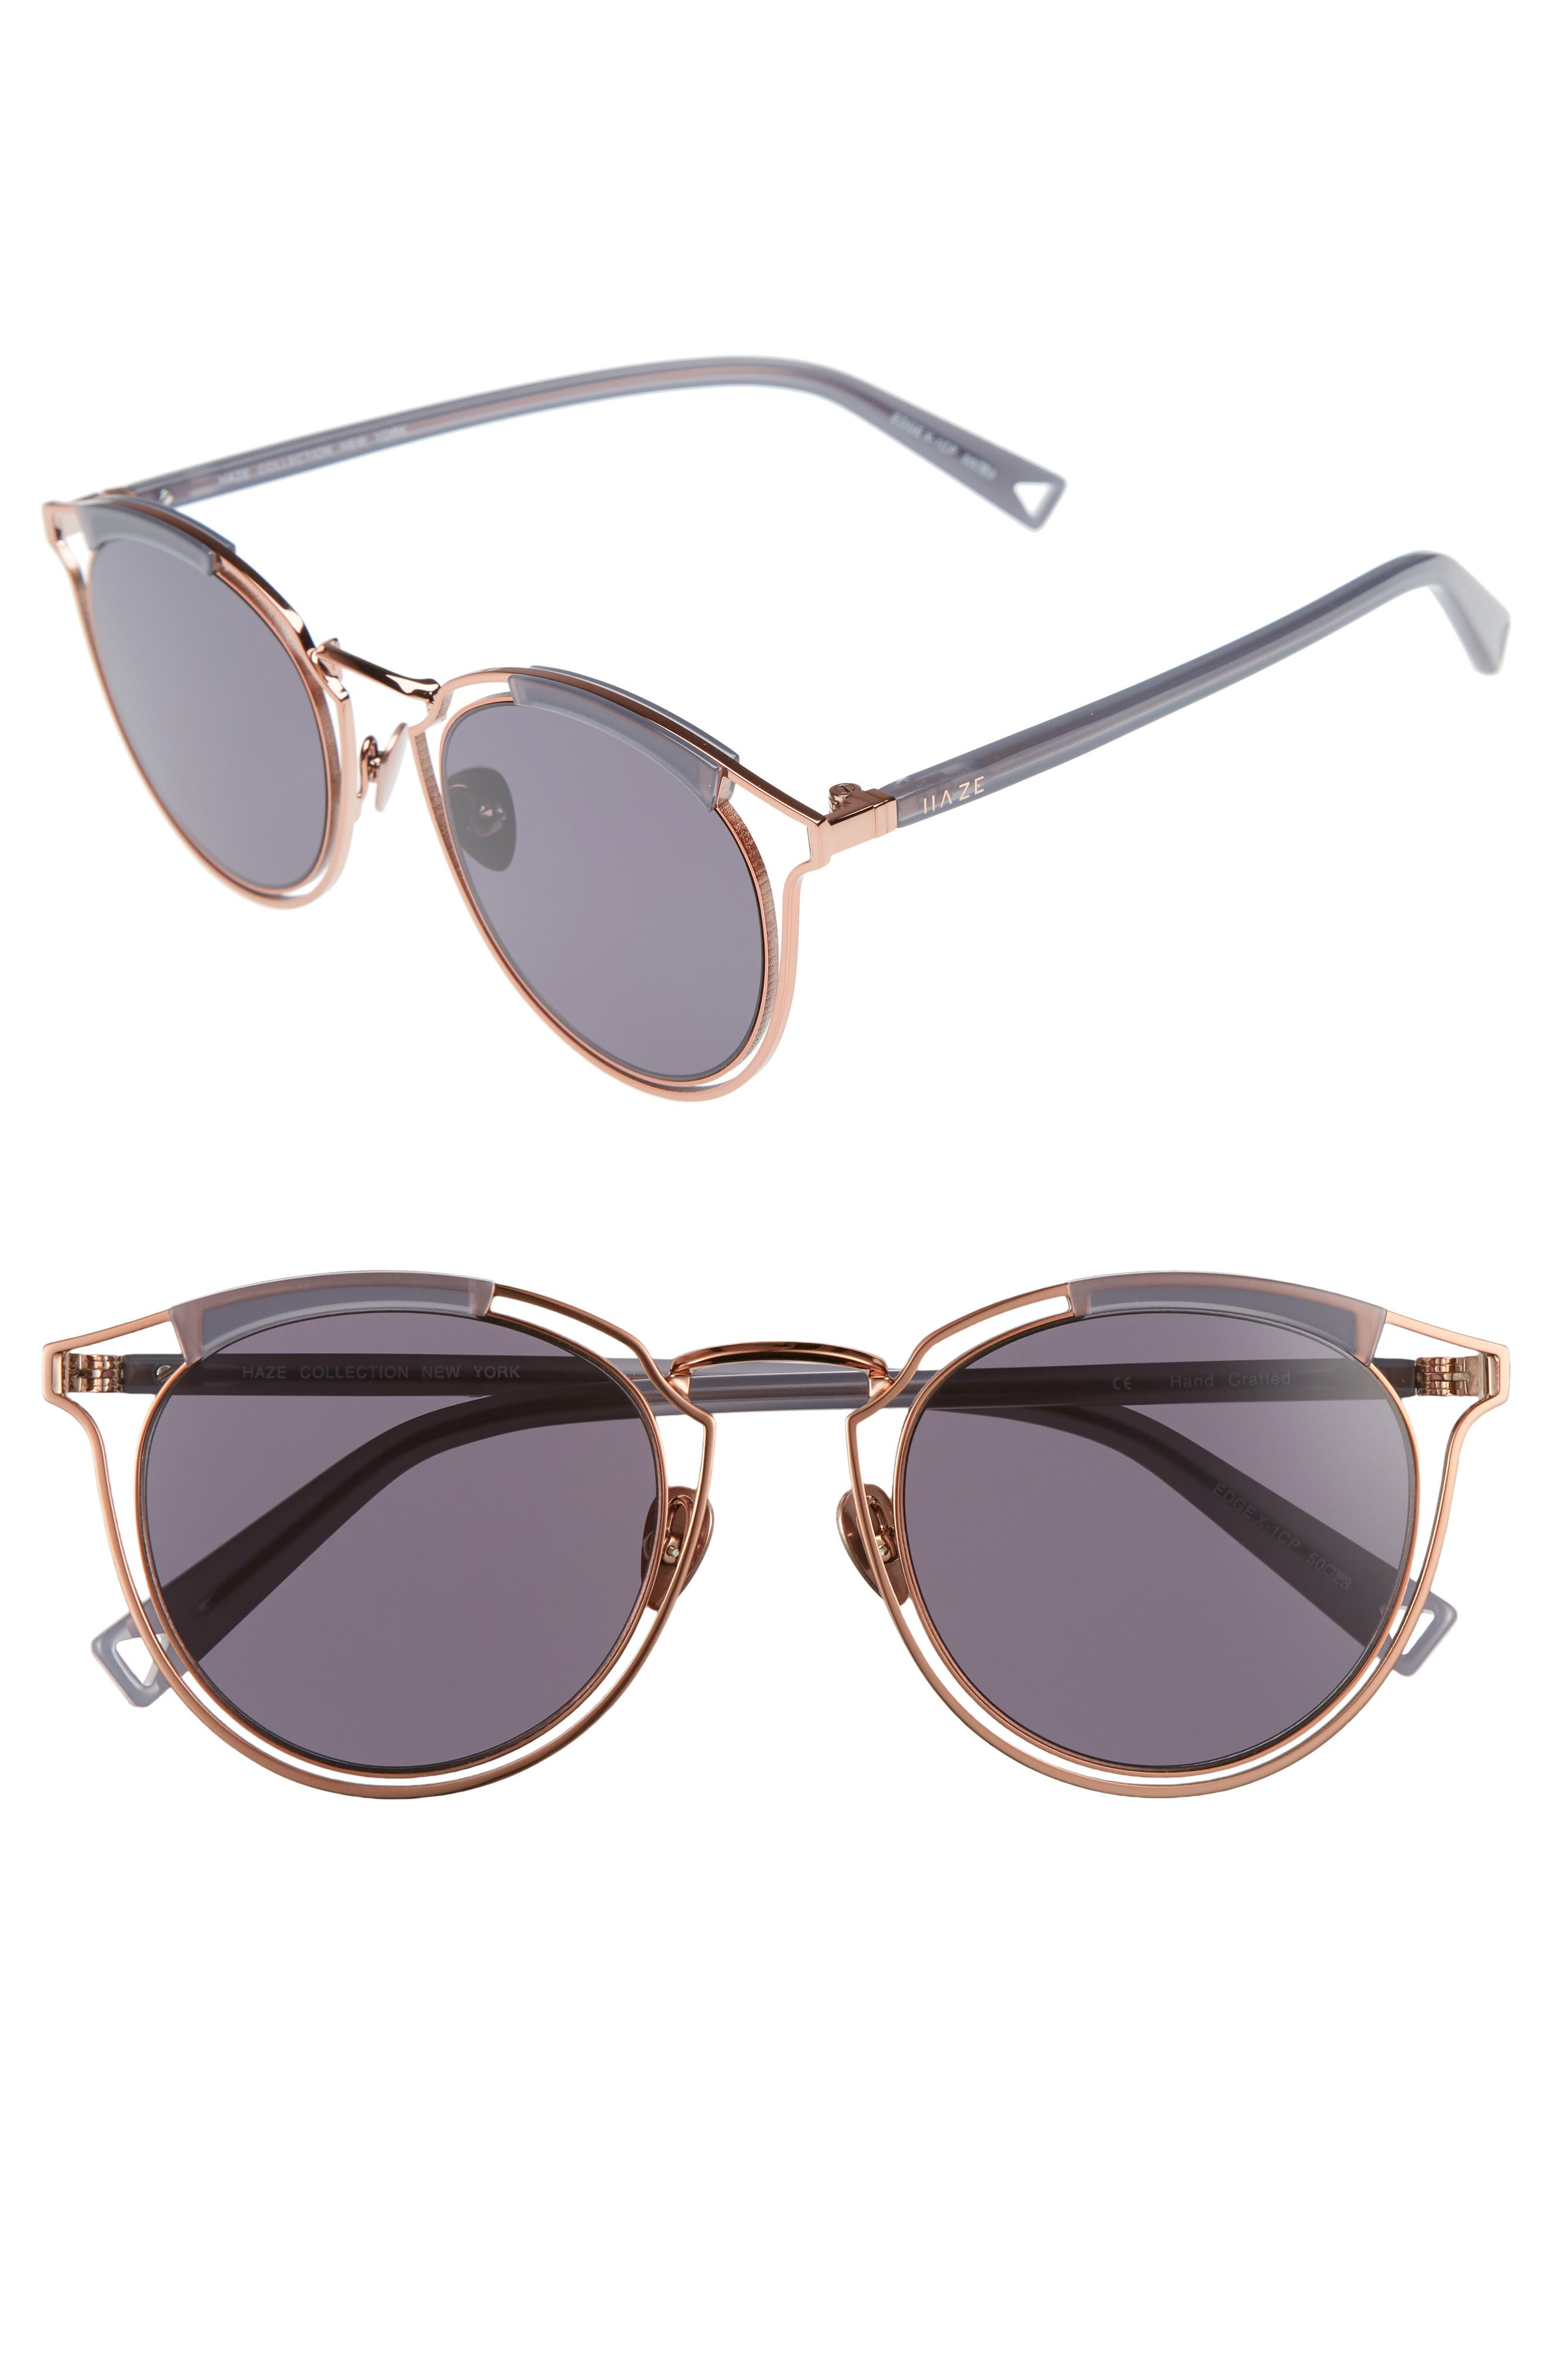 HAZE Edge X 50mm Modified Round Sunglasses